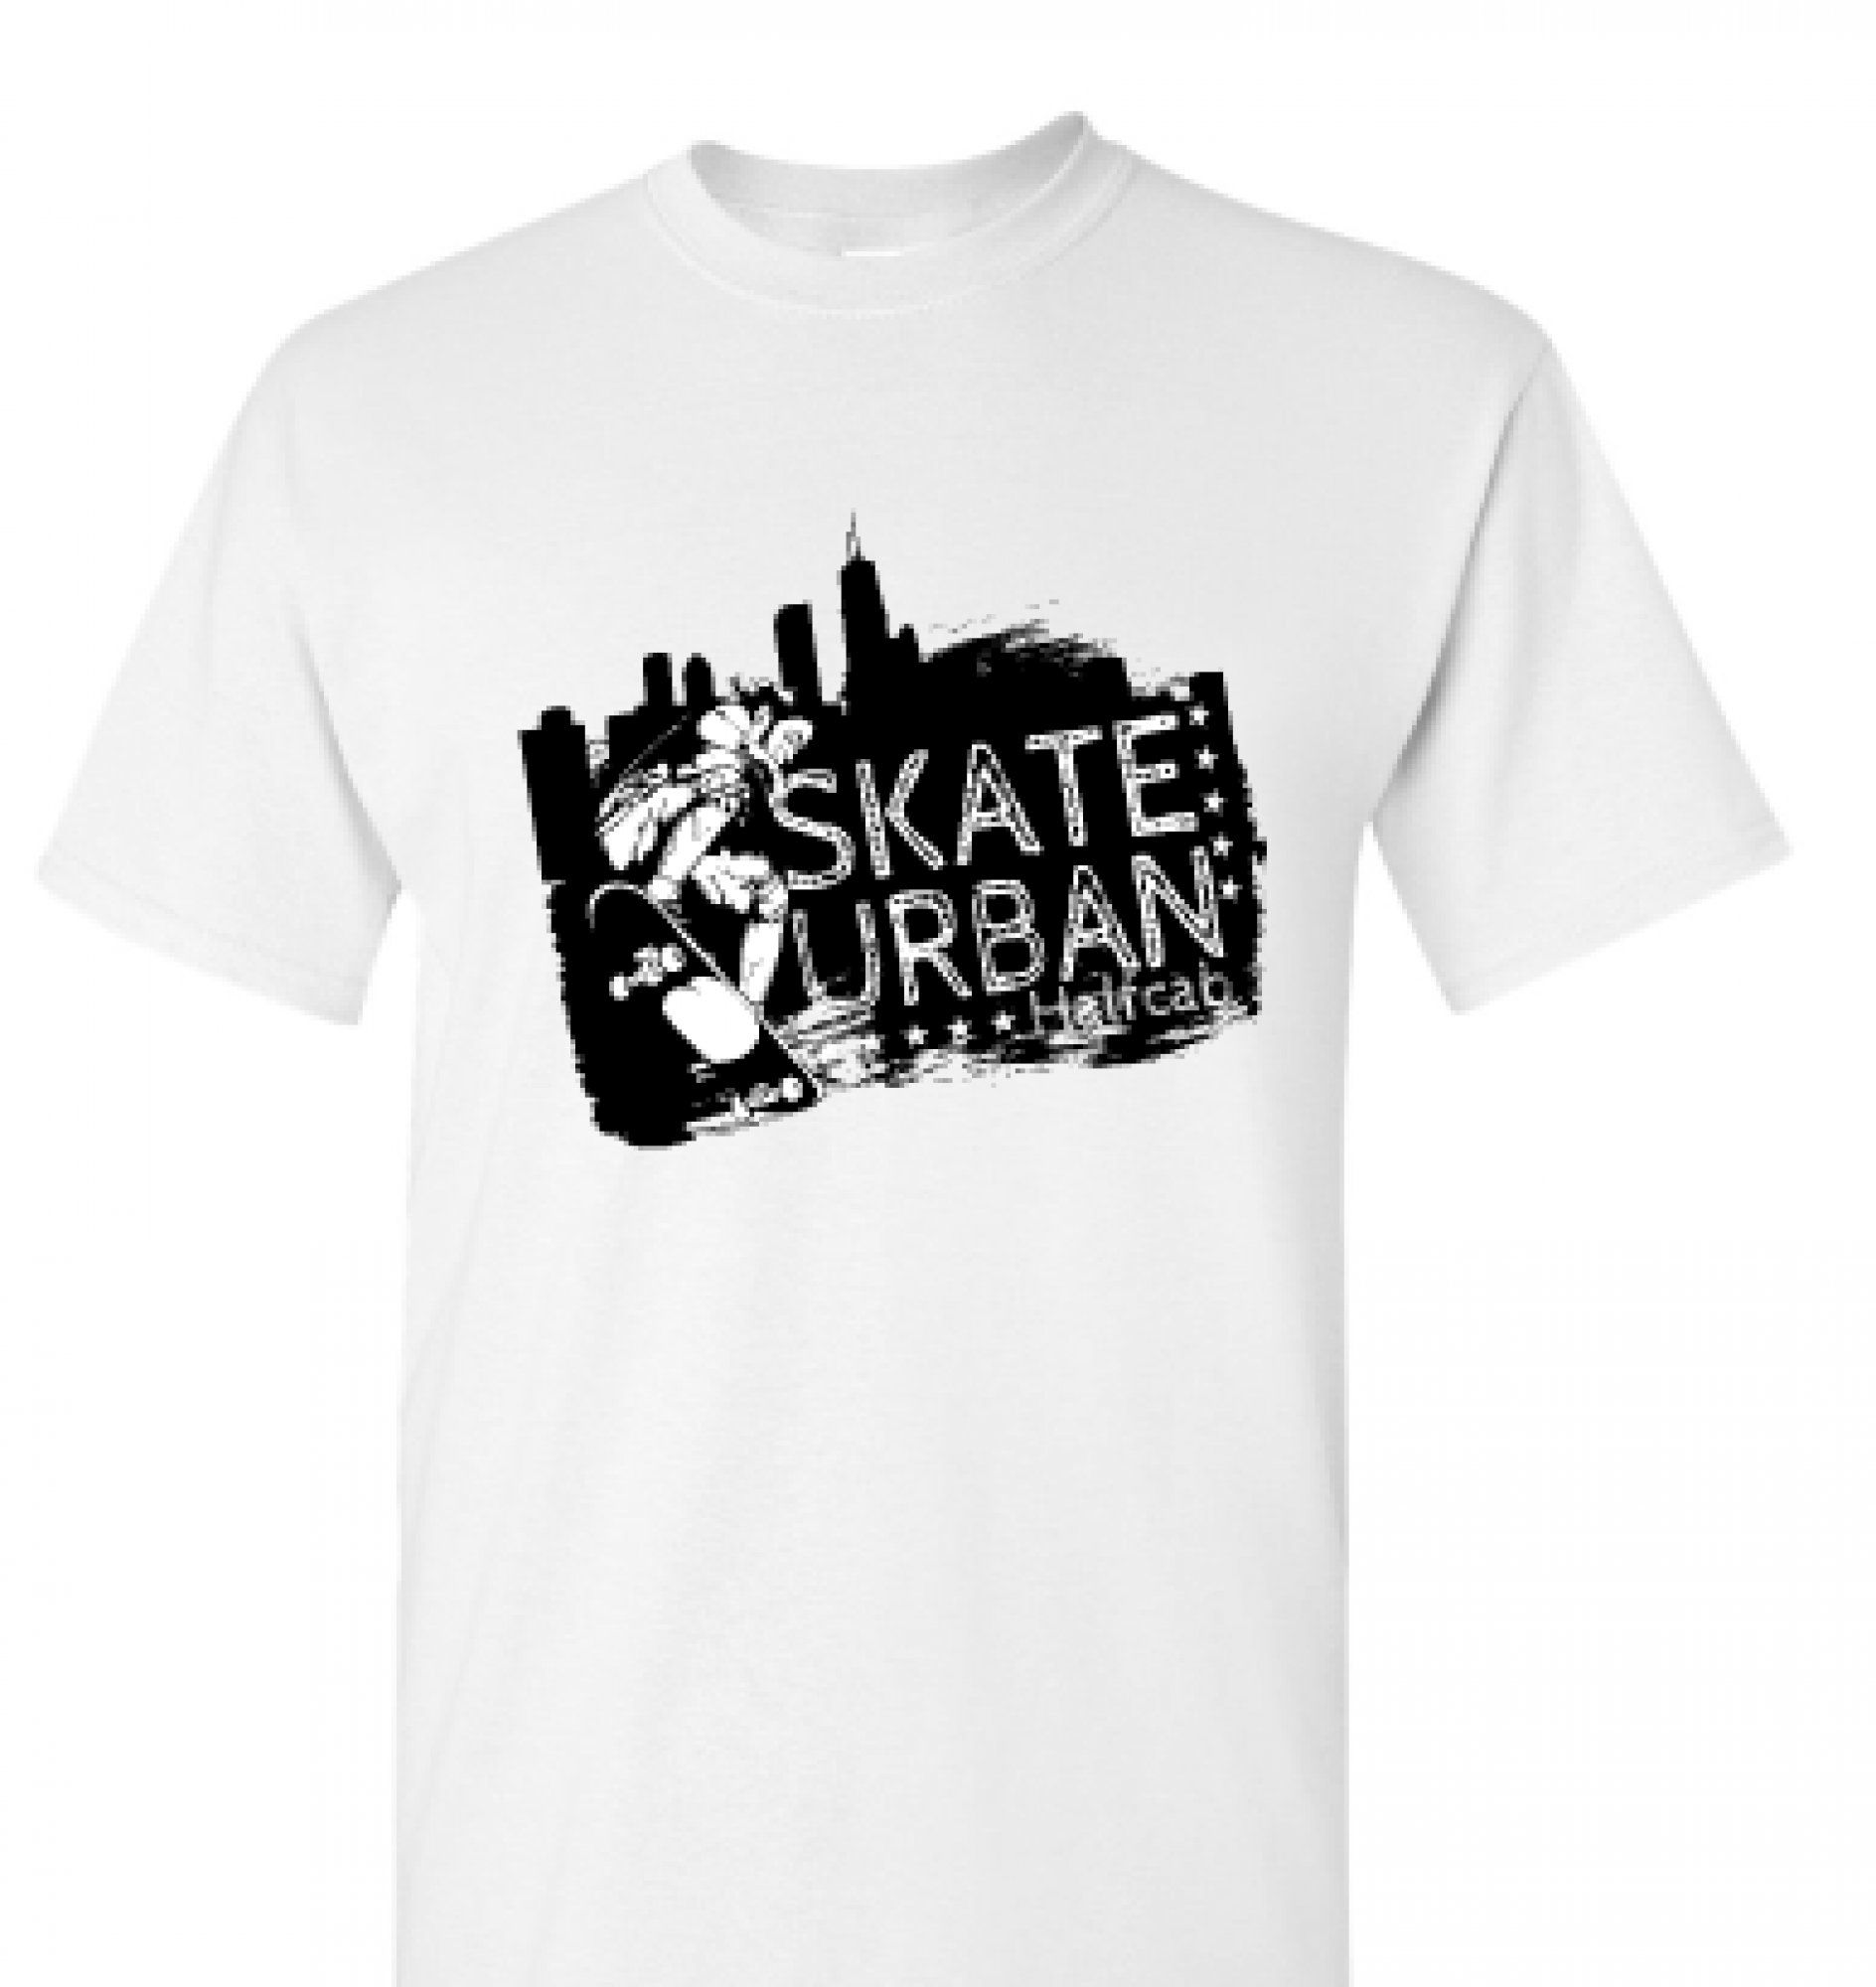 Camiseta Halfcab Skate Urban. www.halfcab.com.br